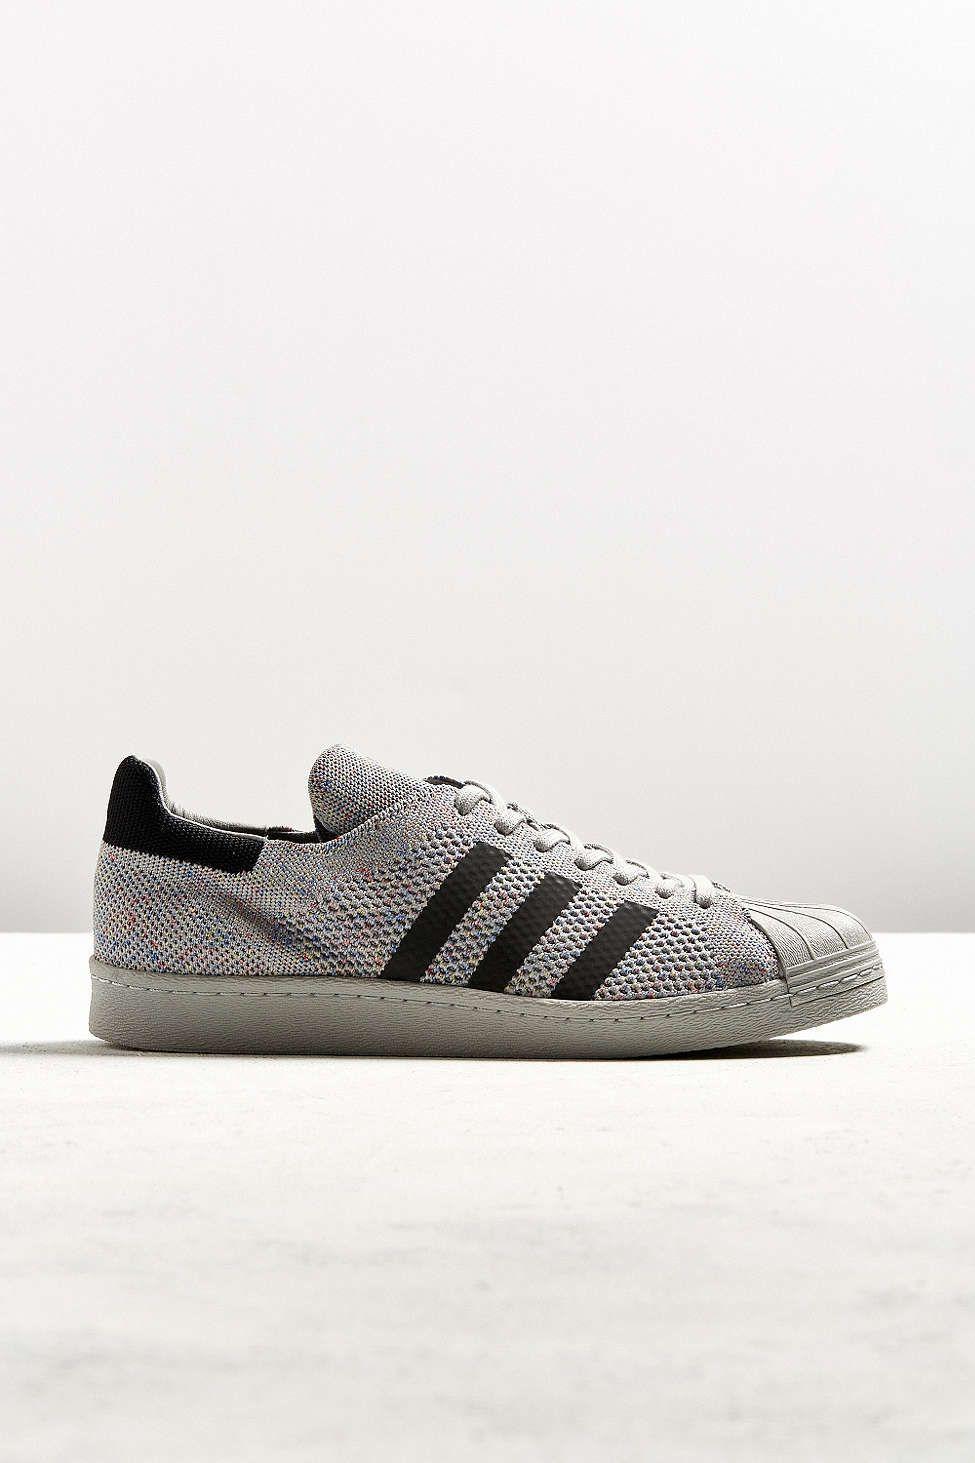 sale retailer 277d7 96281 adidas Superstar 80s Primeknit Sneaker